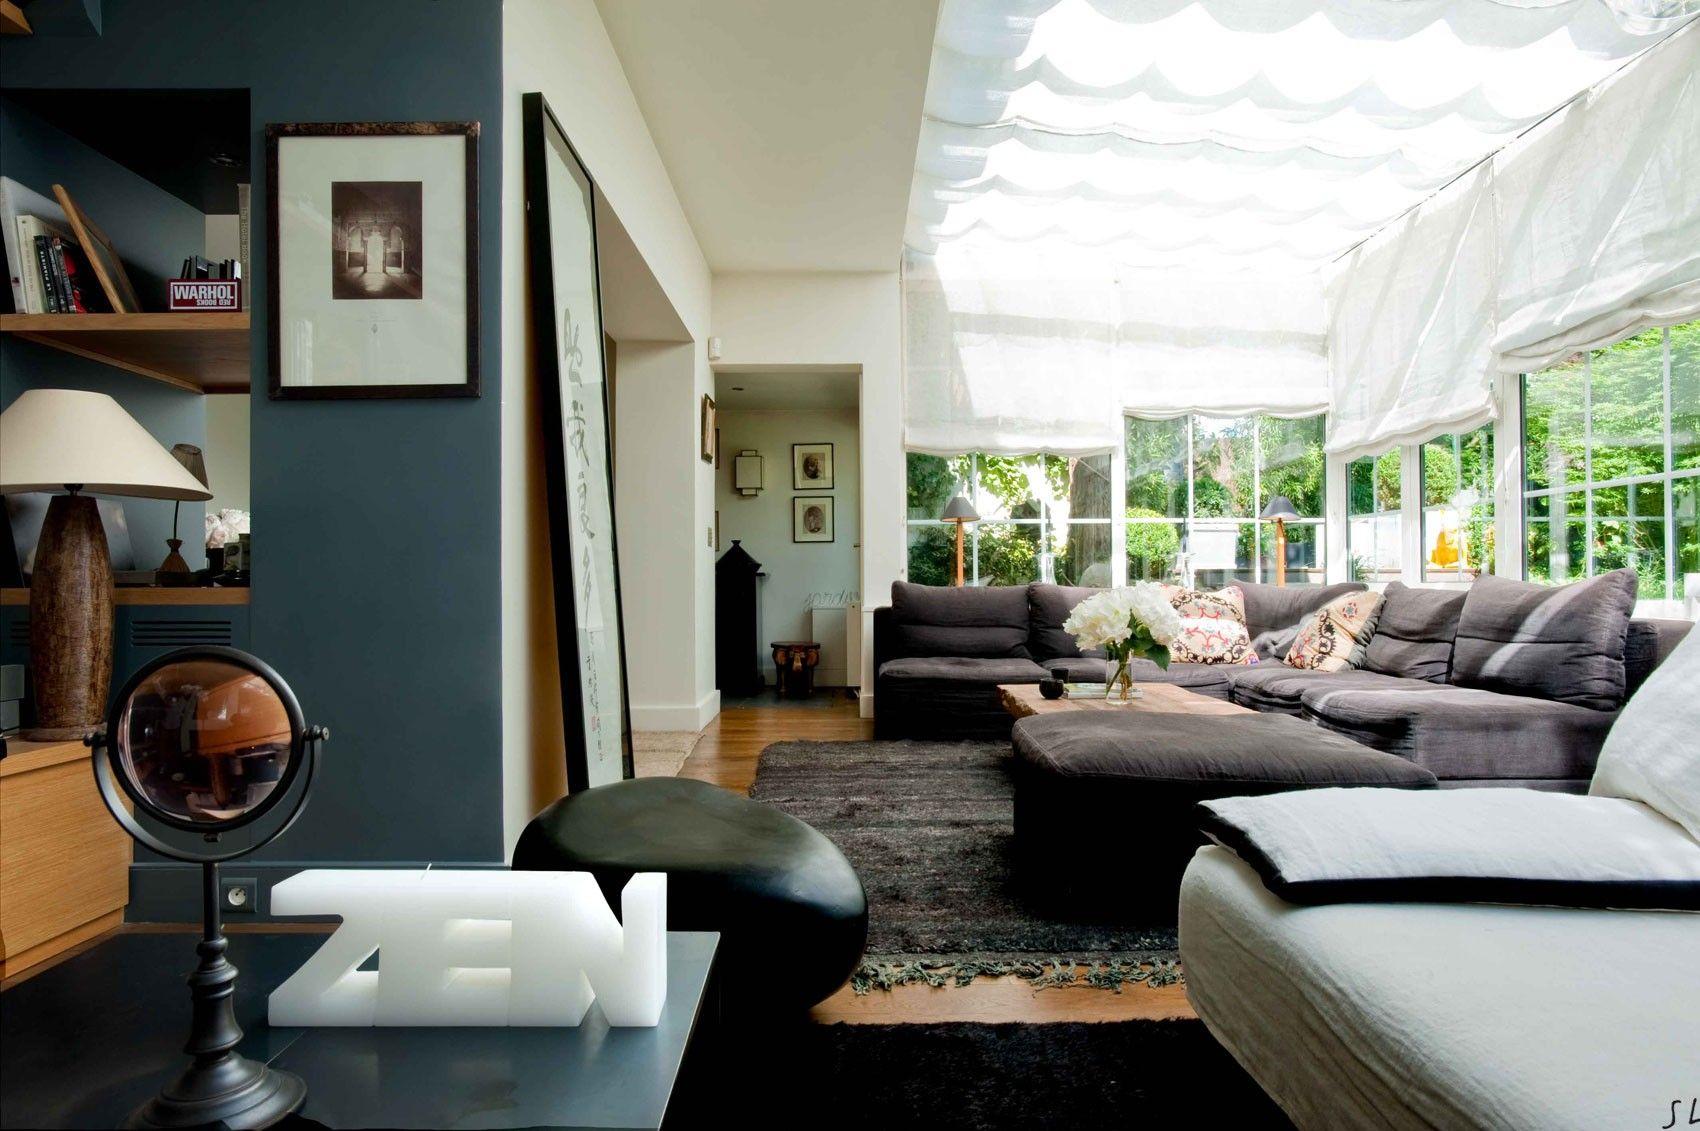 Window ideas for a sunroom  sarah lavoine designer duintérieur  roomsliving room  pinterest